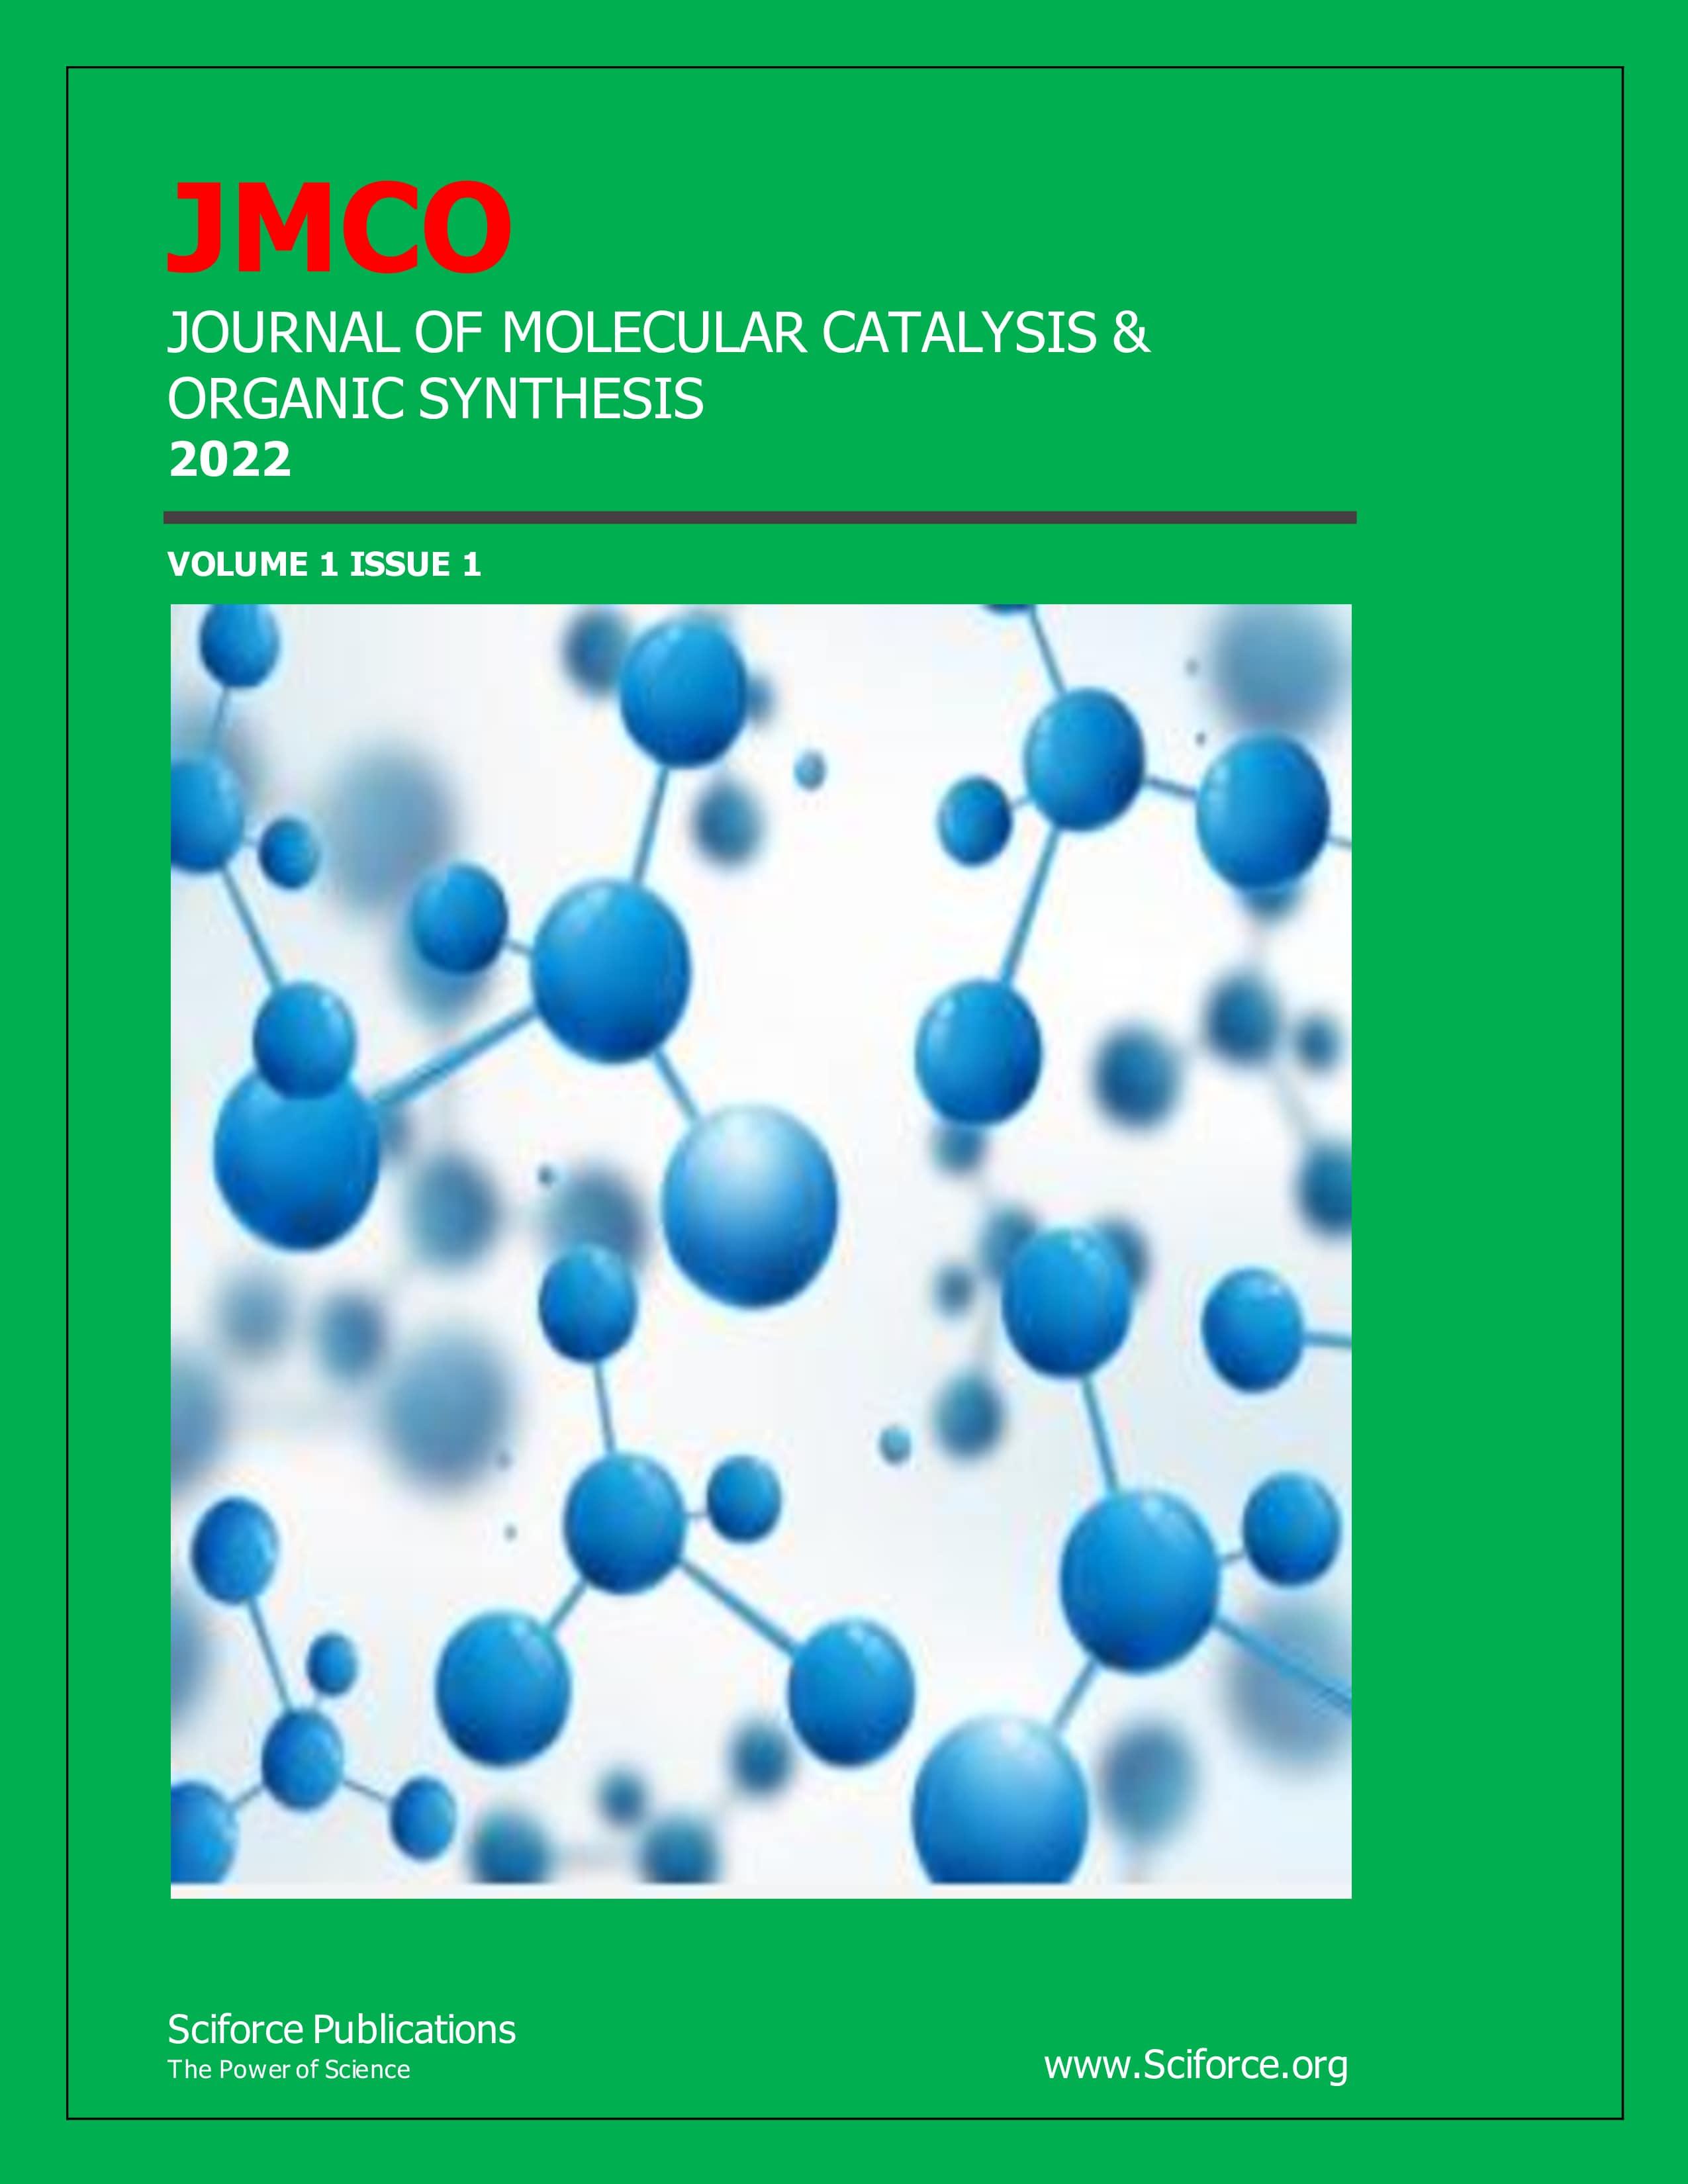 Journal of Molecular Catalysis & Organic Synthesis